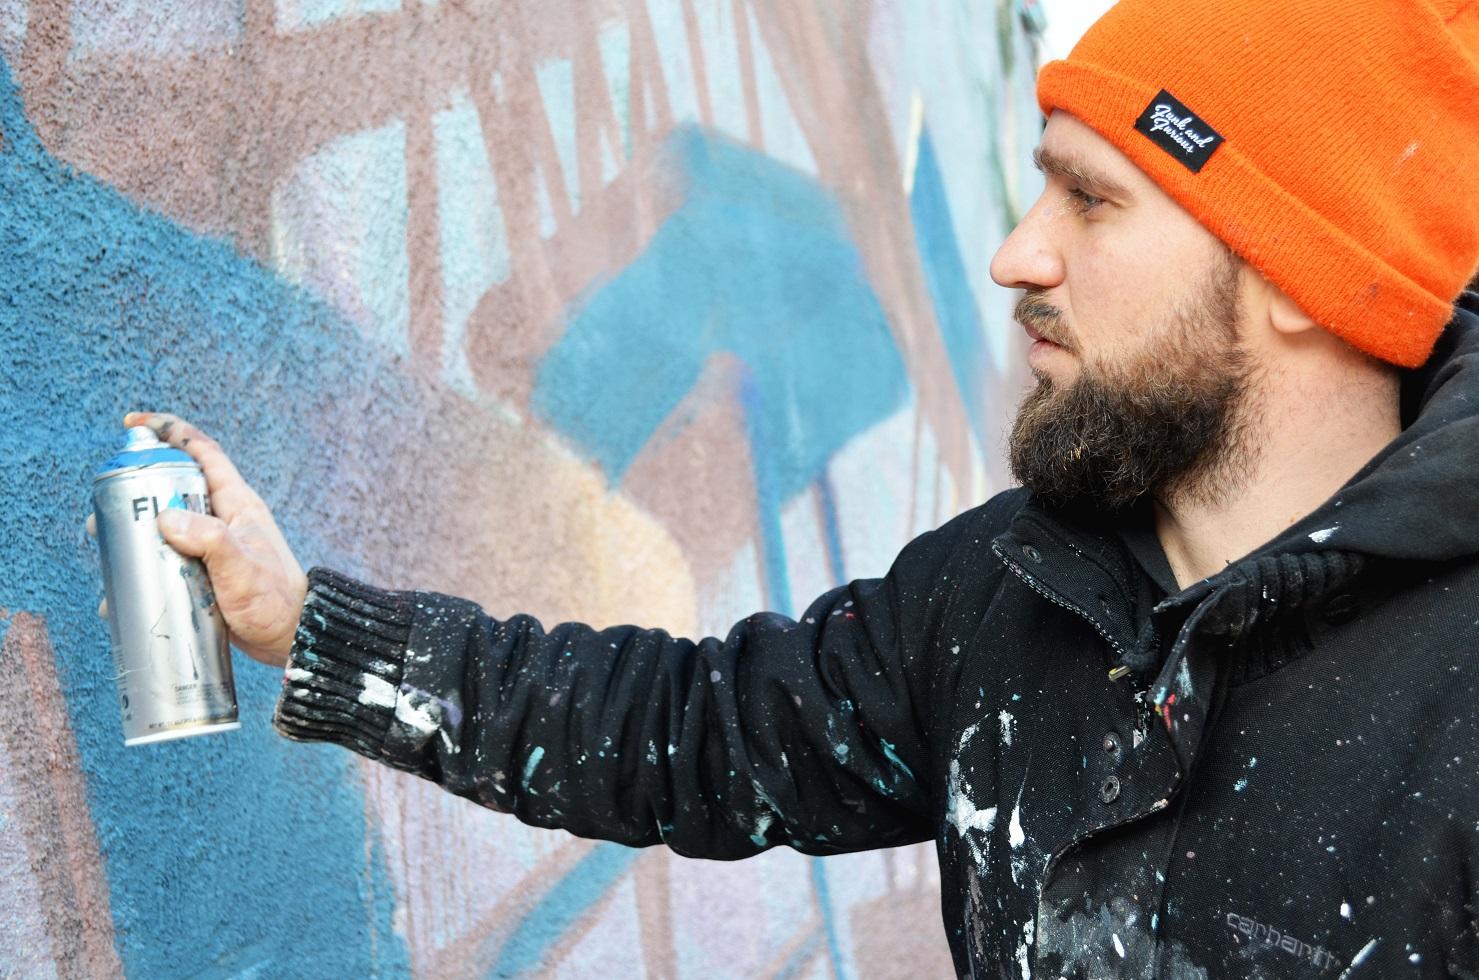 4 1 #art featured, арт, Бразилия, германия, граффити, Грузия, Дино Бенто, искусство, Лапиз, мурал, Саша Корбан, стрит-арт, тбилиси, украина